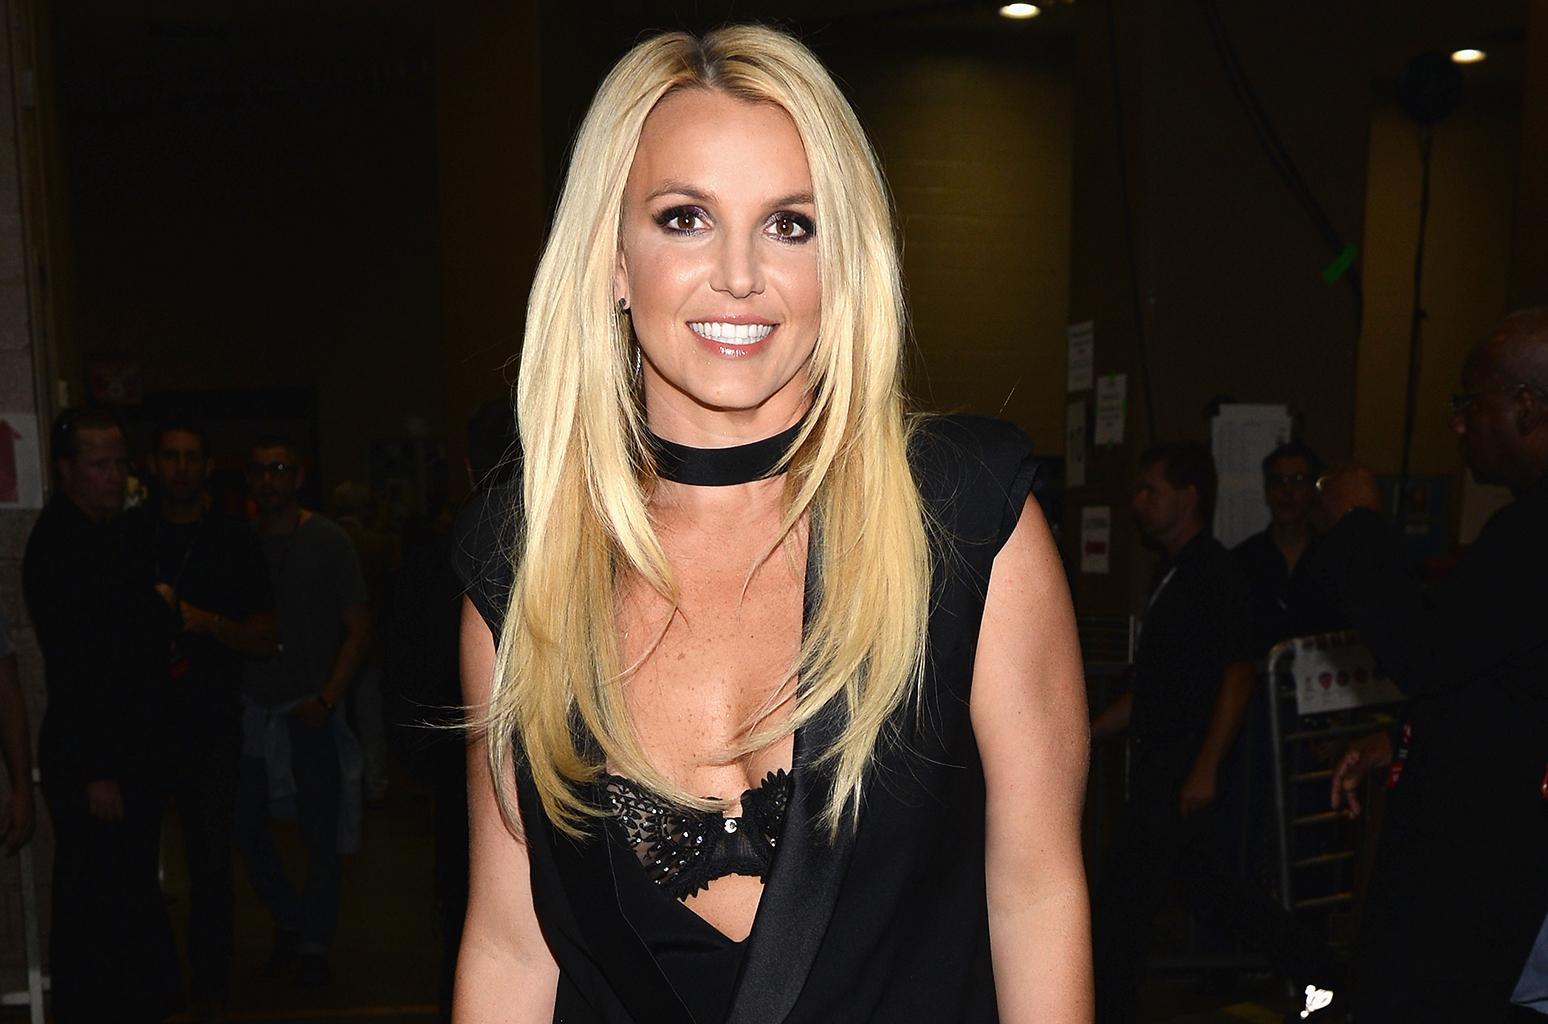 Britney-Spears-iheart-radio-1548-2016-billboard-650